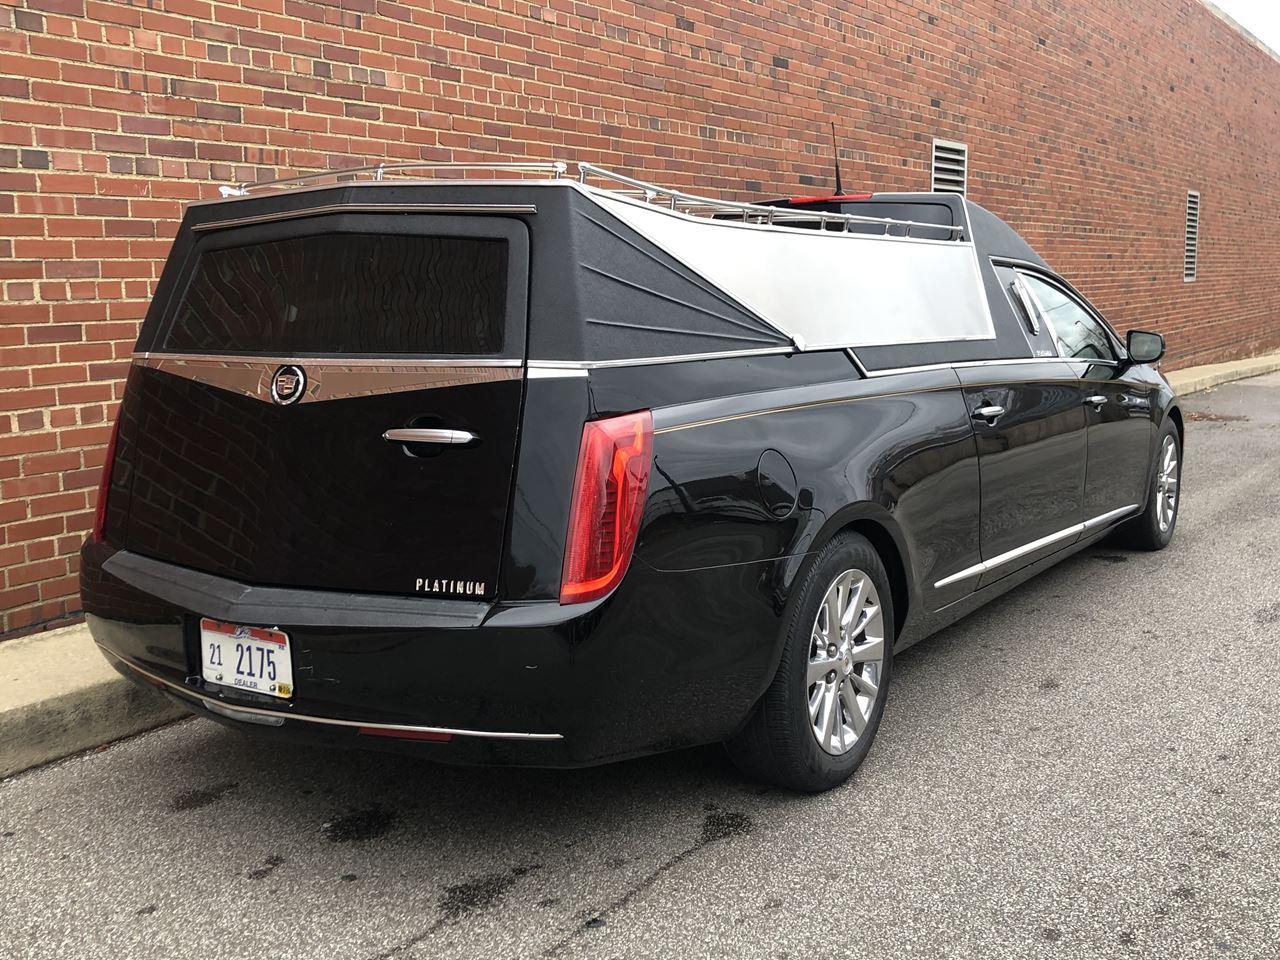 2014 Platinum Cadillac Cortege Hearse For Sale Near Me